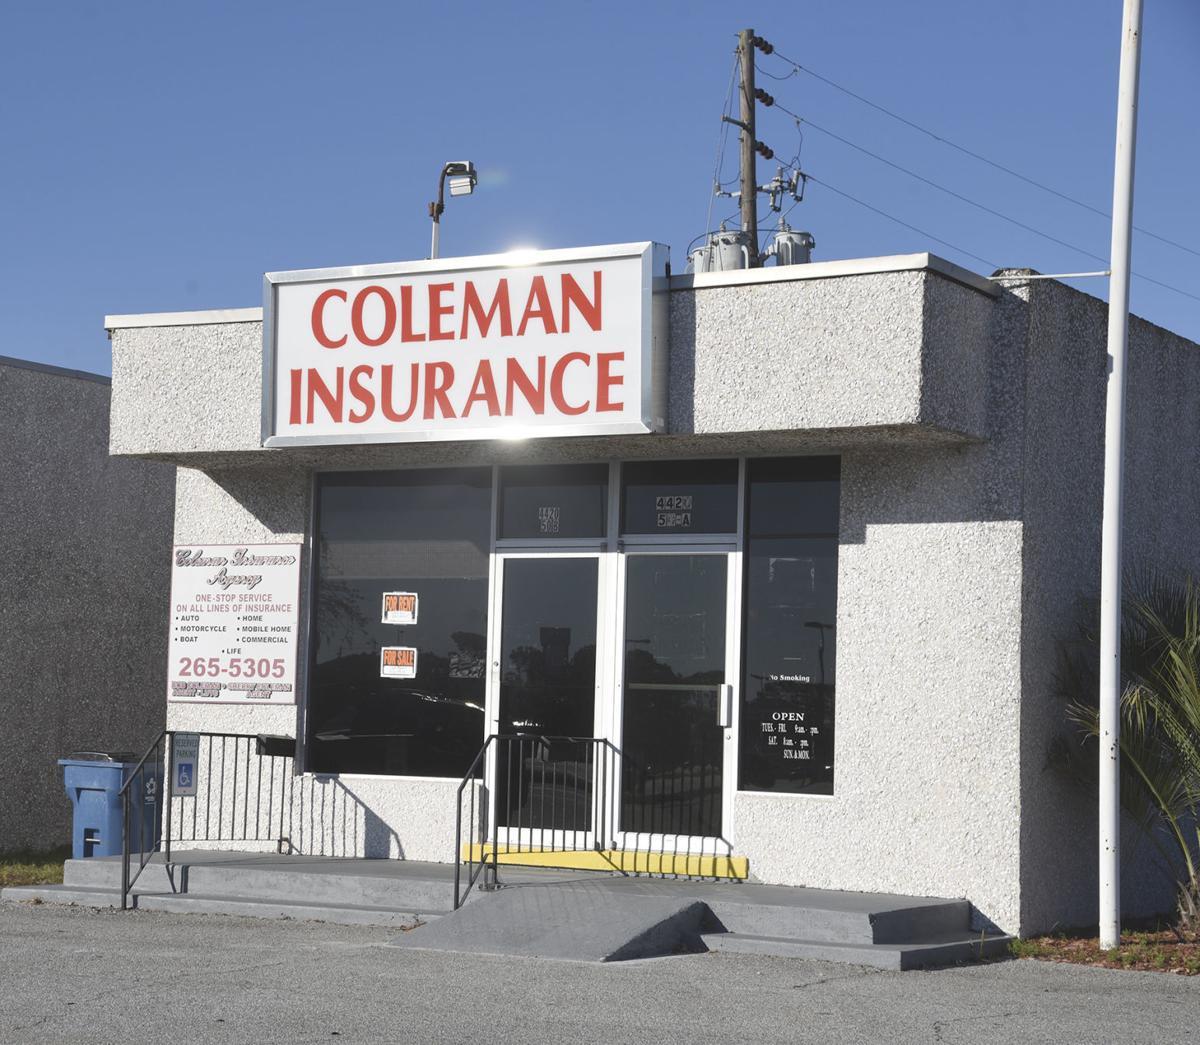 011019_coleman insurance